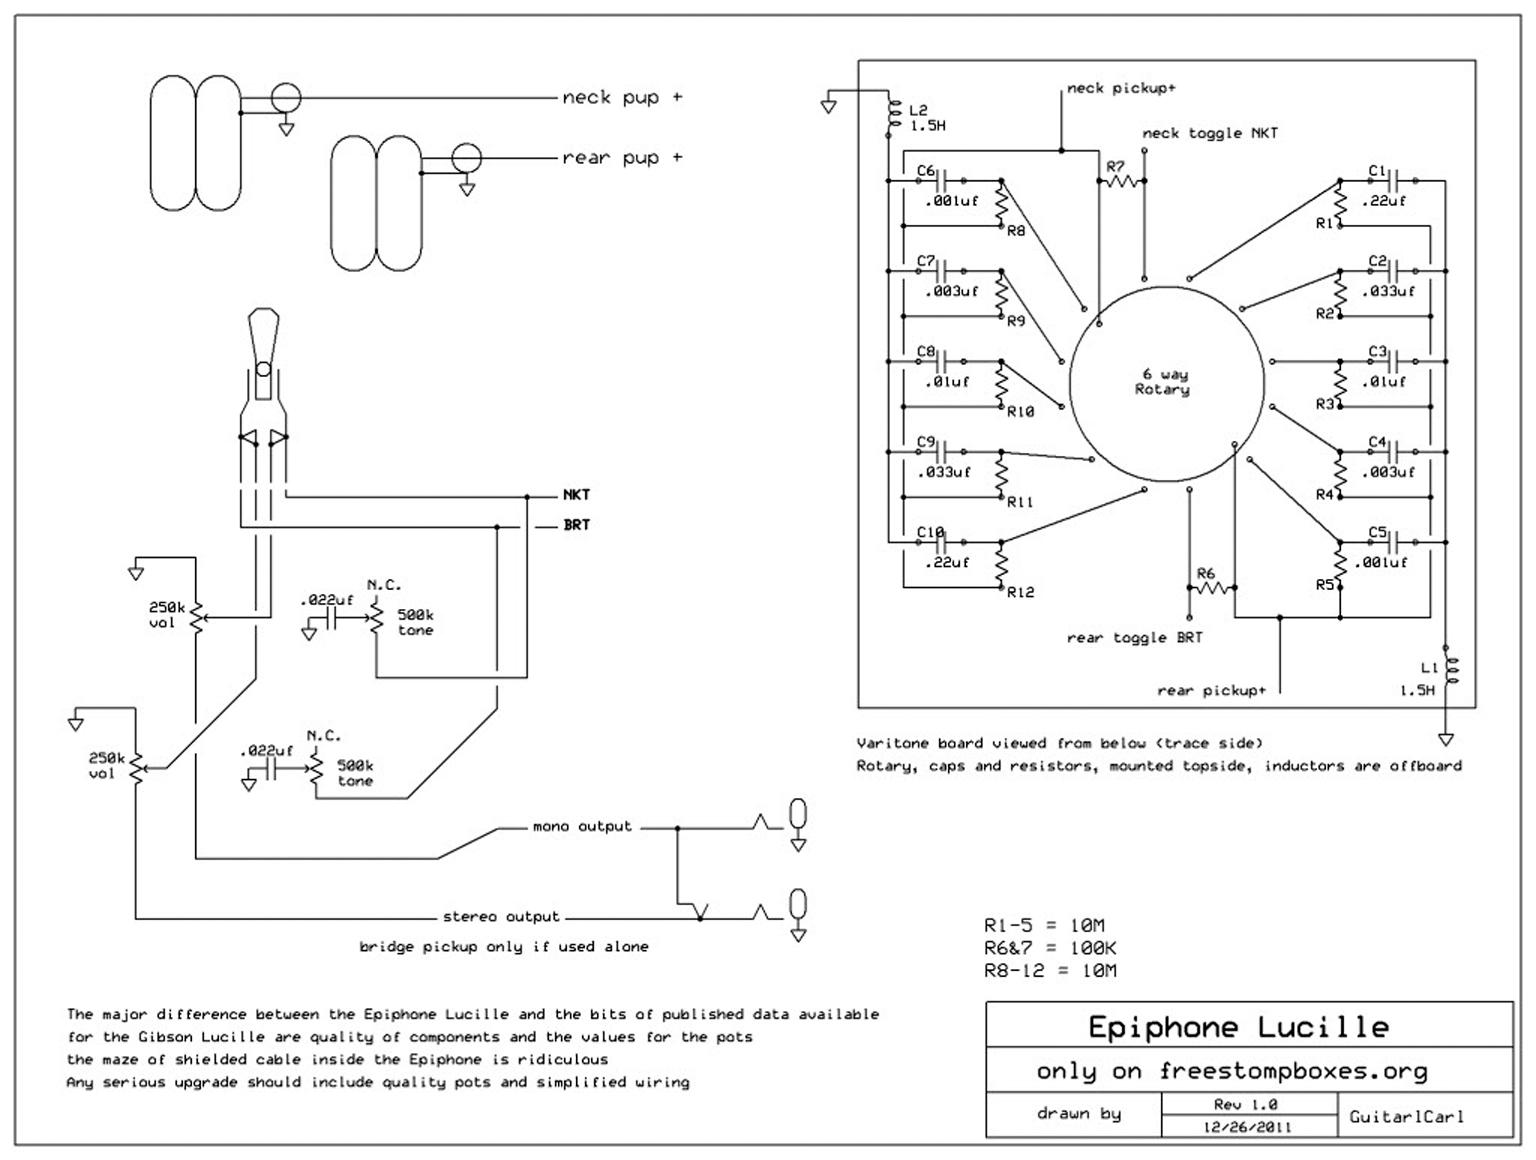 bc rich warlock wiring diagram vo 5412  varitone wiring diagram  vo 5412  varitone wiring diagram